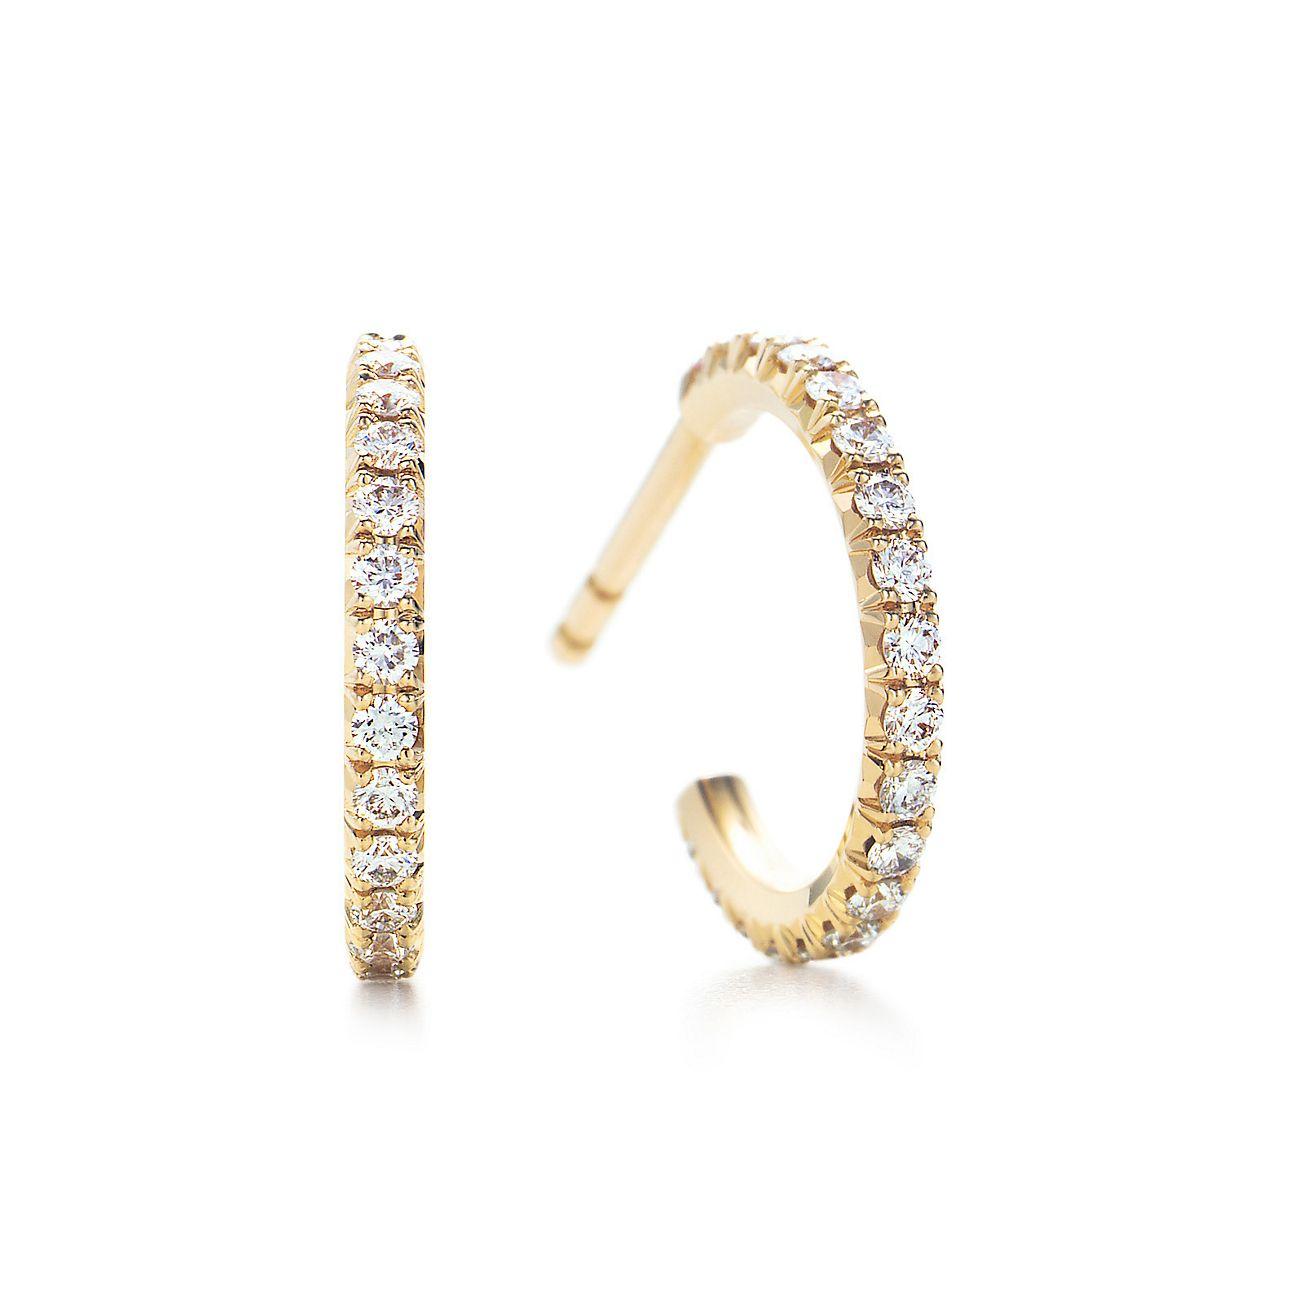 tiffany earrings gold hoop the wife guide gold hoop